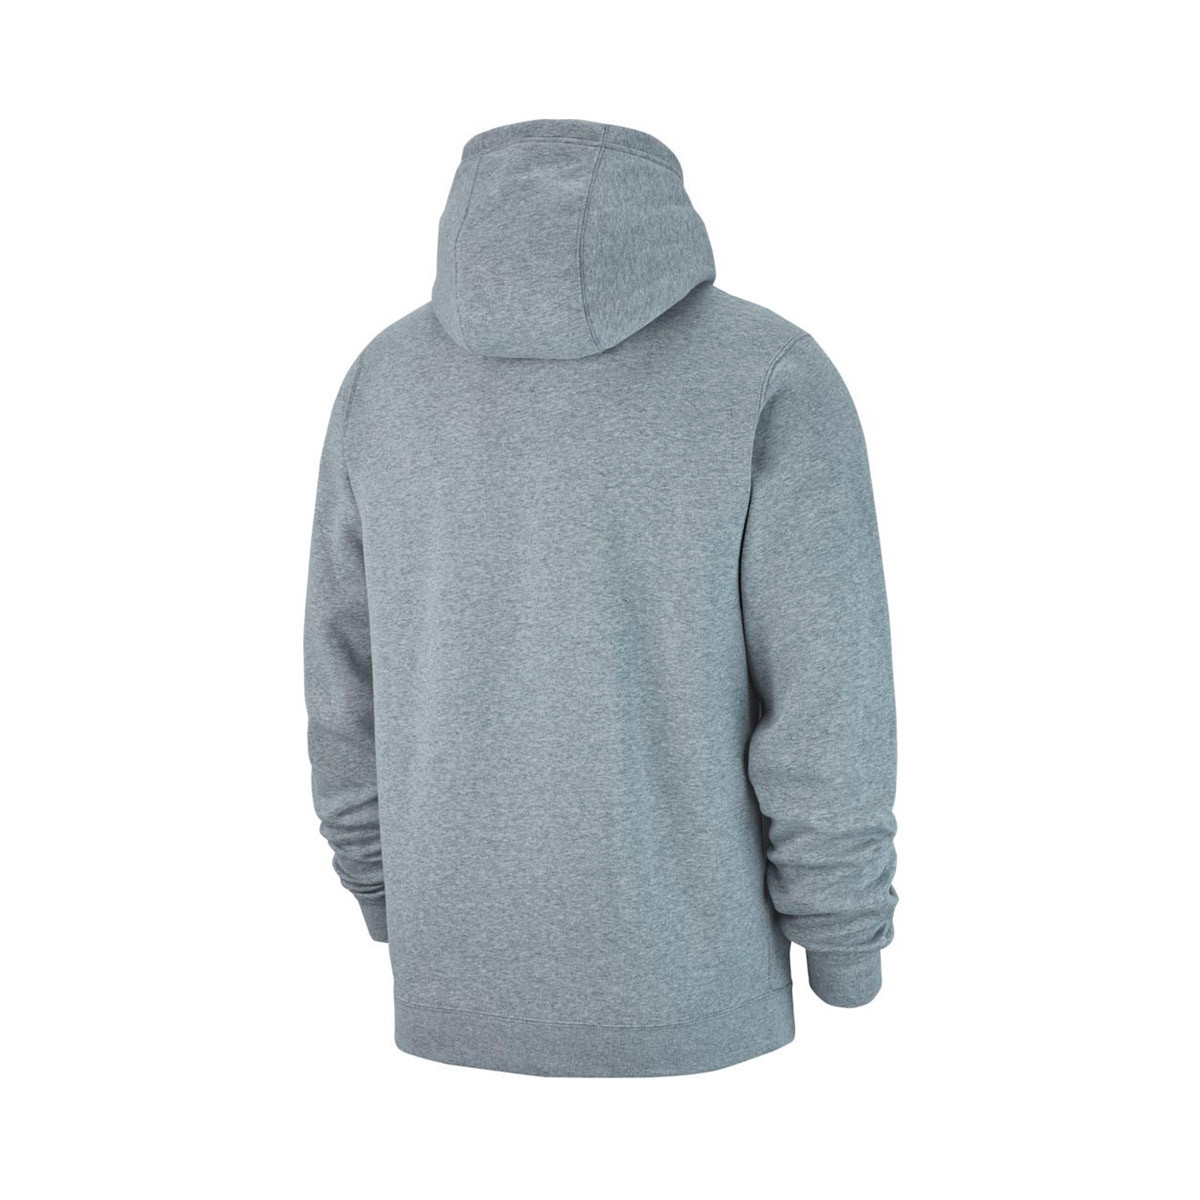 0a9309dd84 Jacket Nike Kids Club 19 Full-Zip Hoodie Dark grey heather-Dark ...